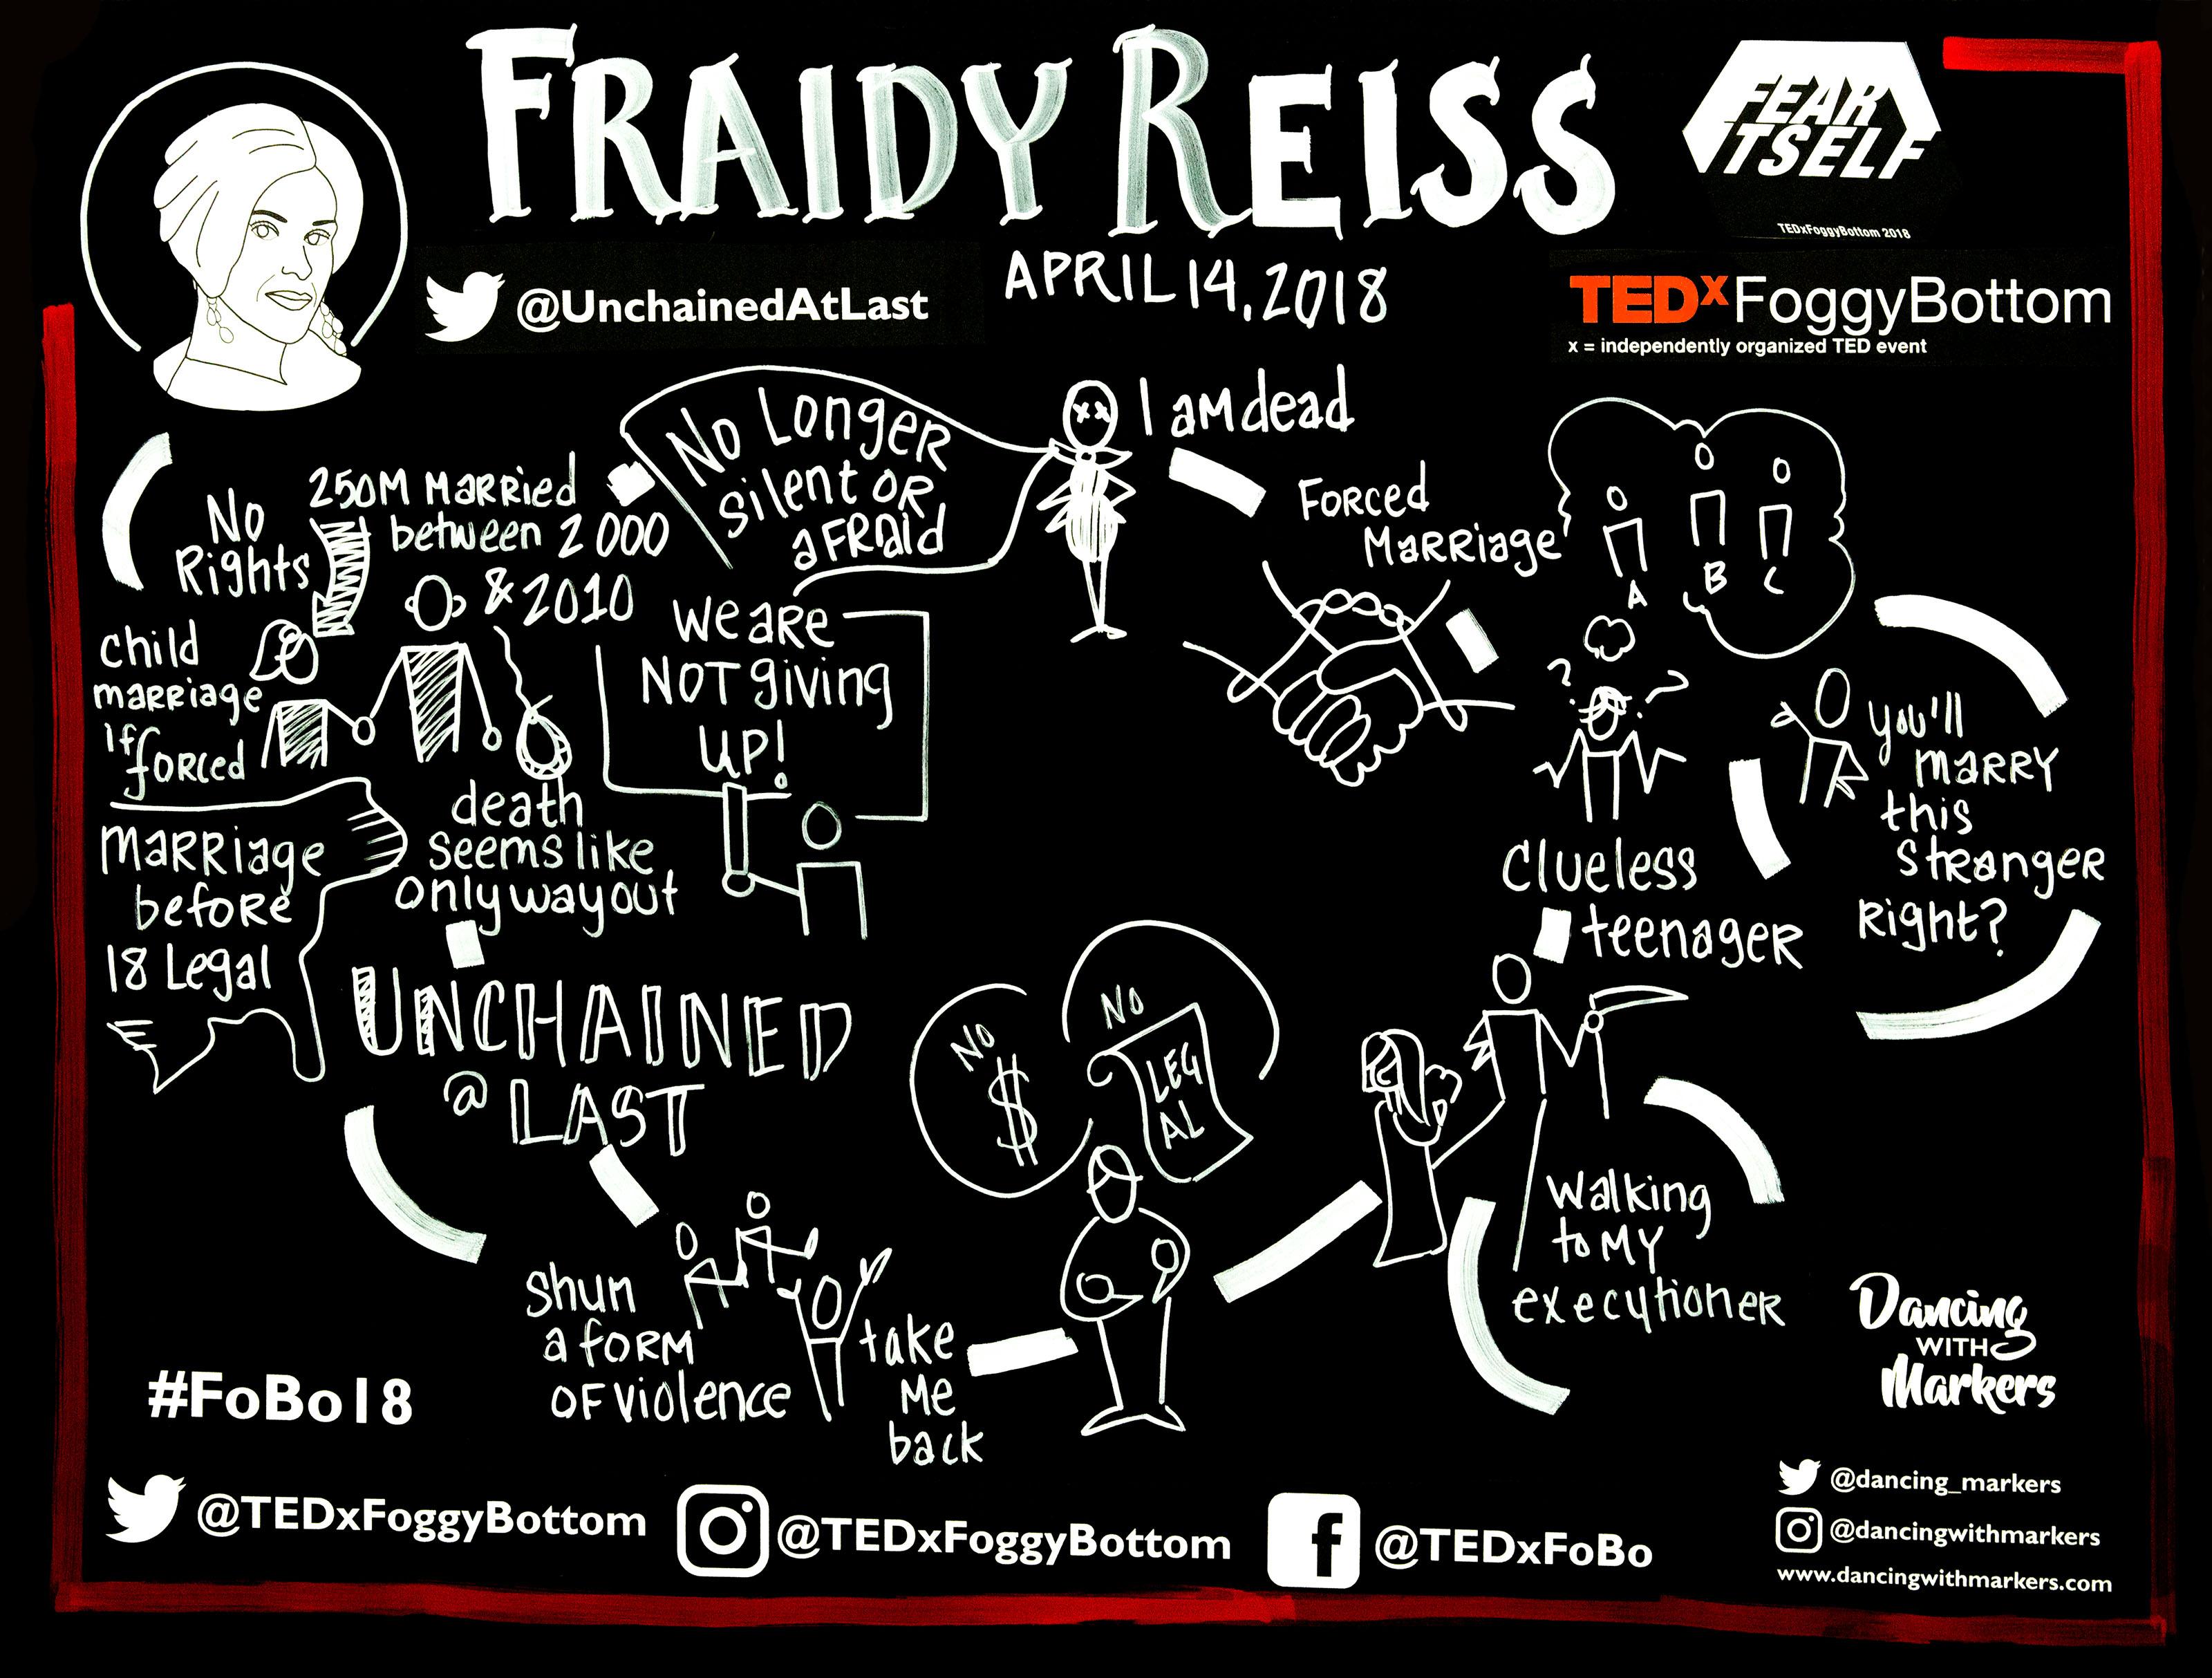 TEDx Foggy Bottom Fraidy Reiss Graphic Recording